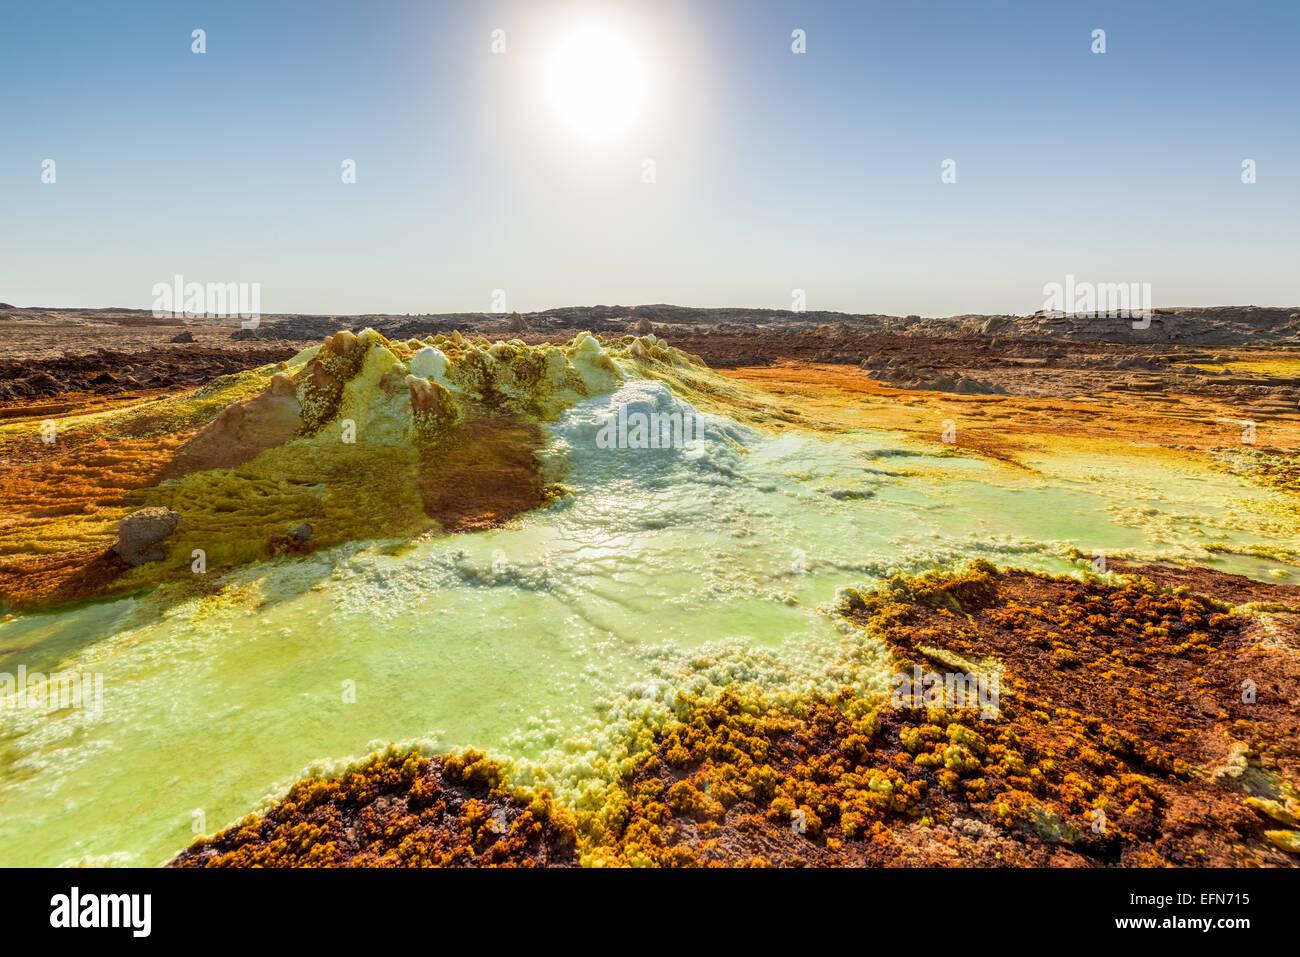 Sulfuric acid pools in Dallol in Ethiopia - Stock Image